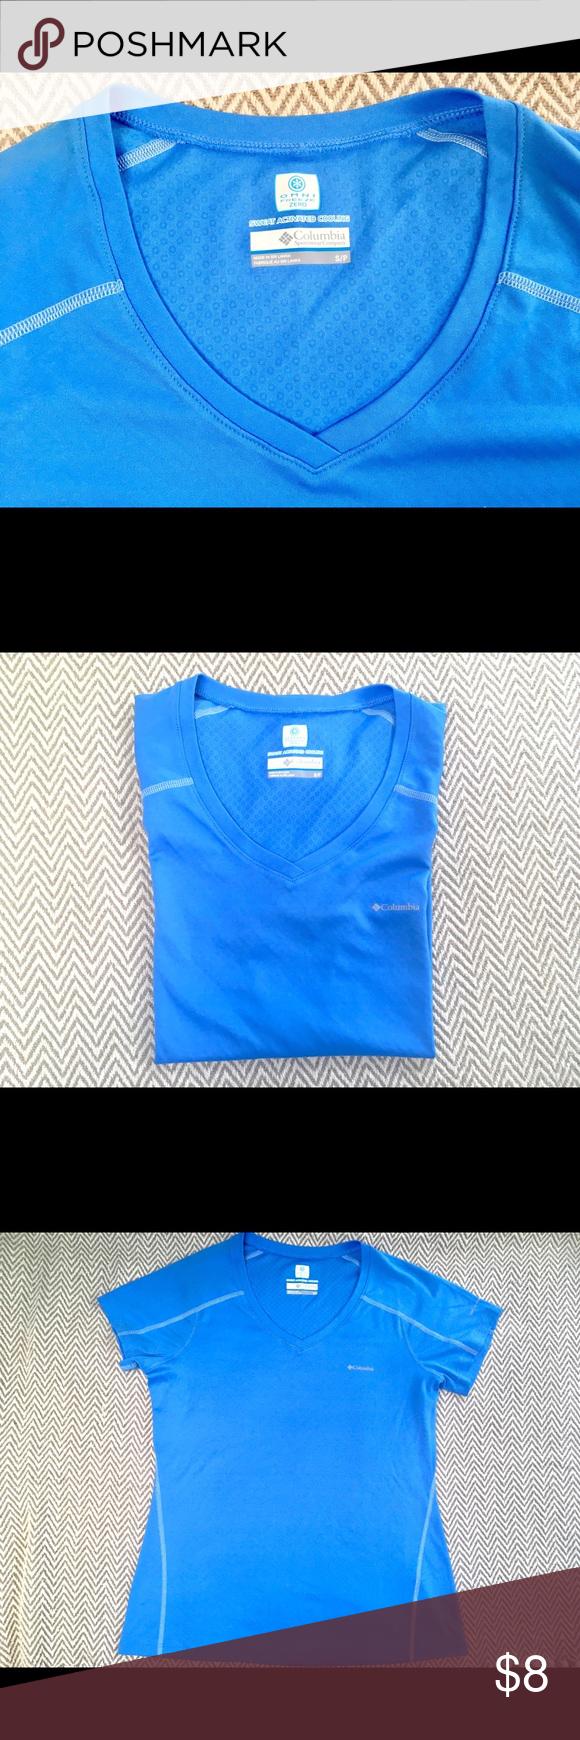 Columbia Omni Freeze Zero Active Shirt Active Shirts Columbia